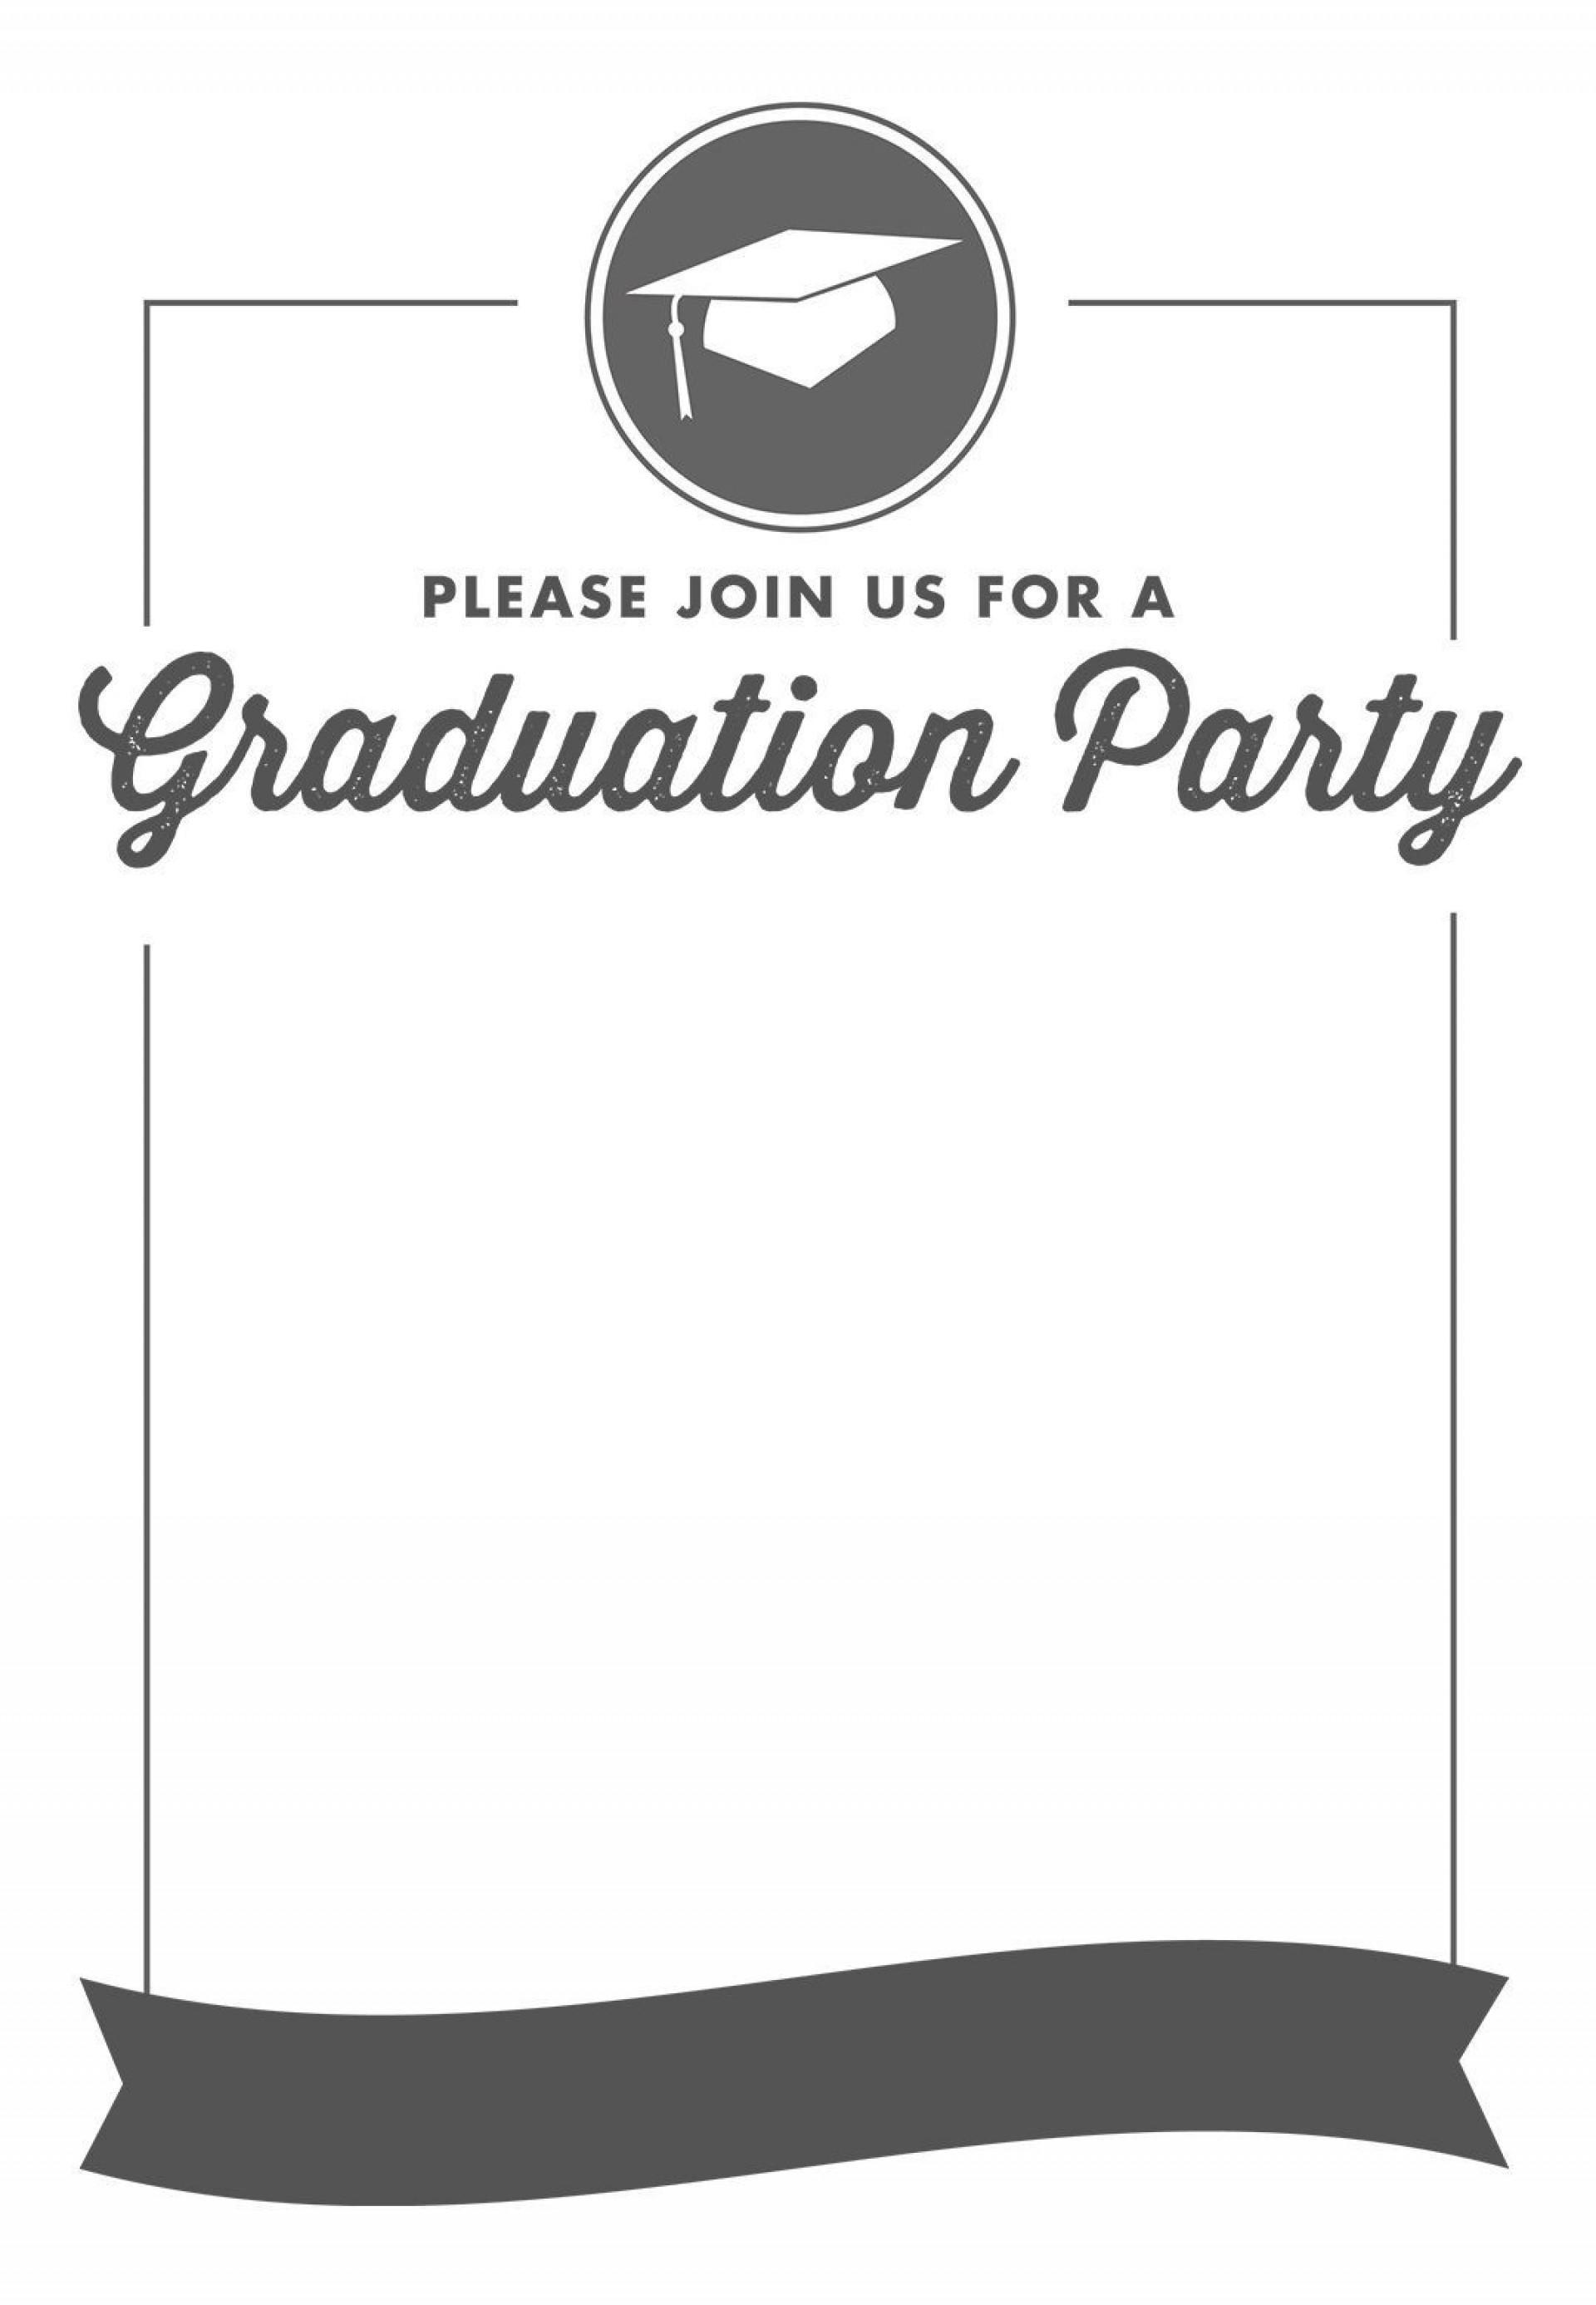 002 Unbelievable Free Graduation Invitation Template Printable High Resolution  Kindergarten Party Card1920